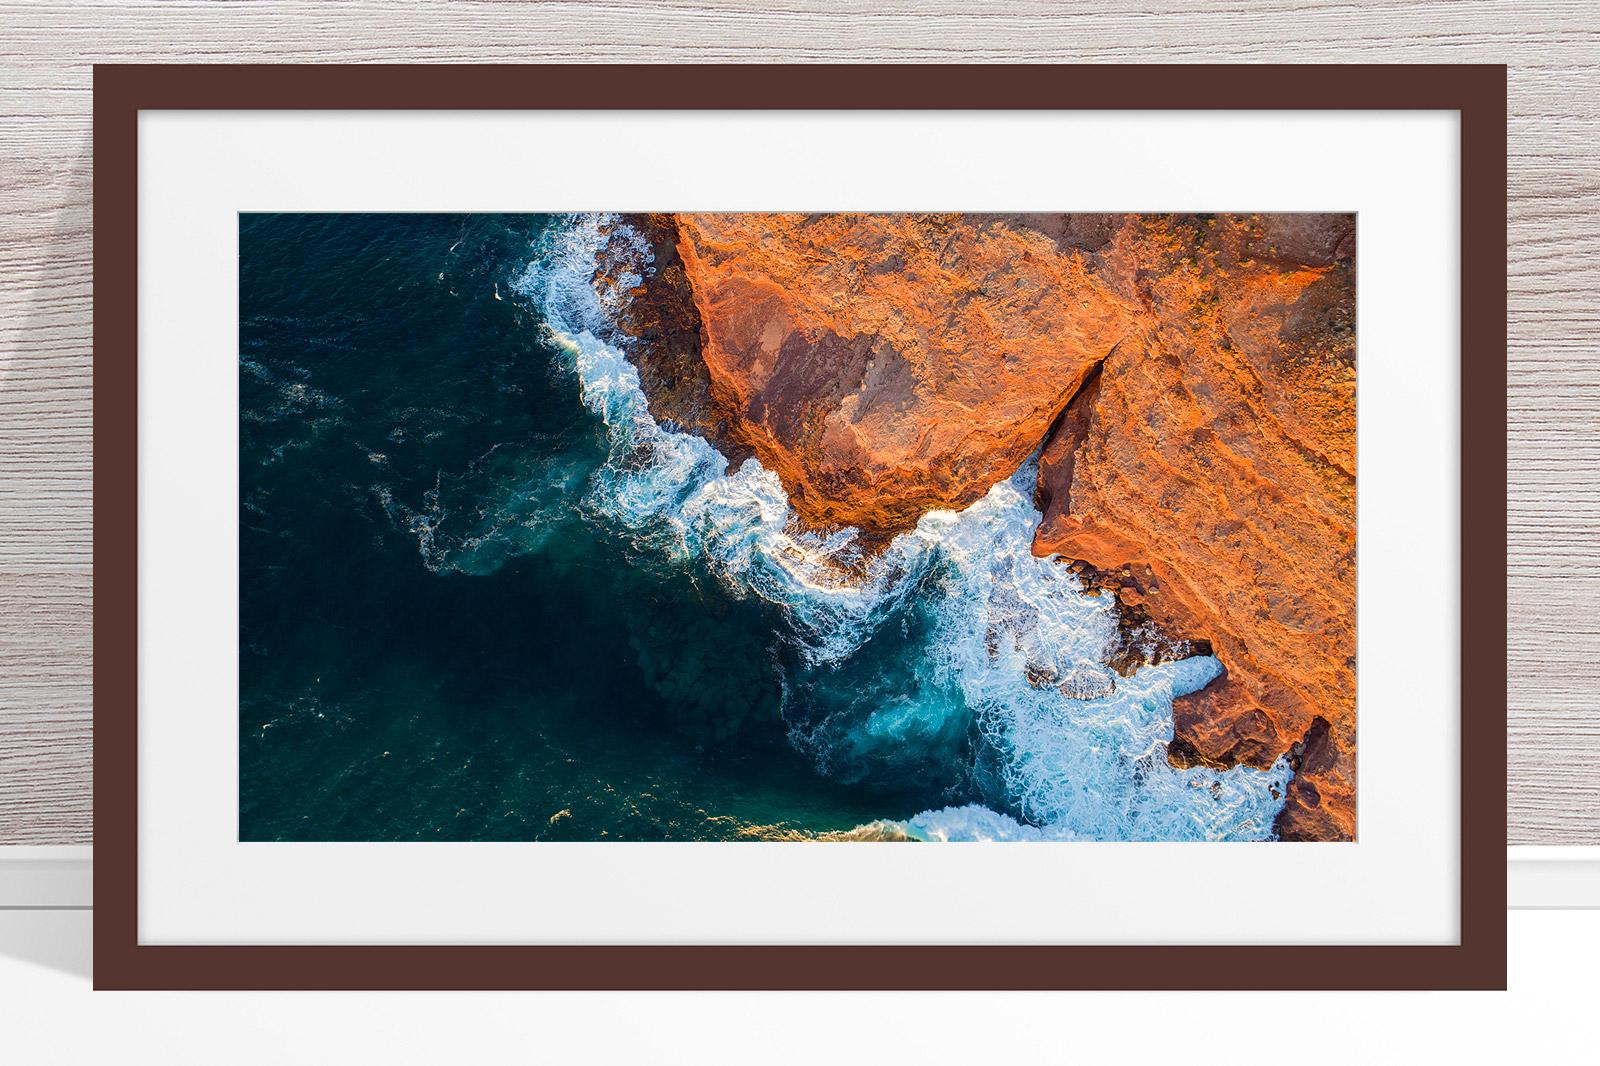 008 - Jason Mazur - 'Kalbarri Coastline' Dark Frame